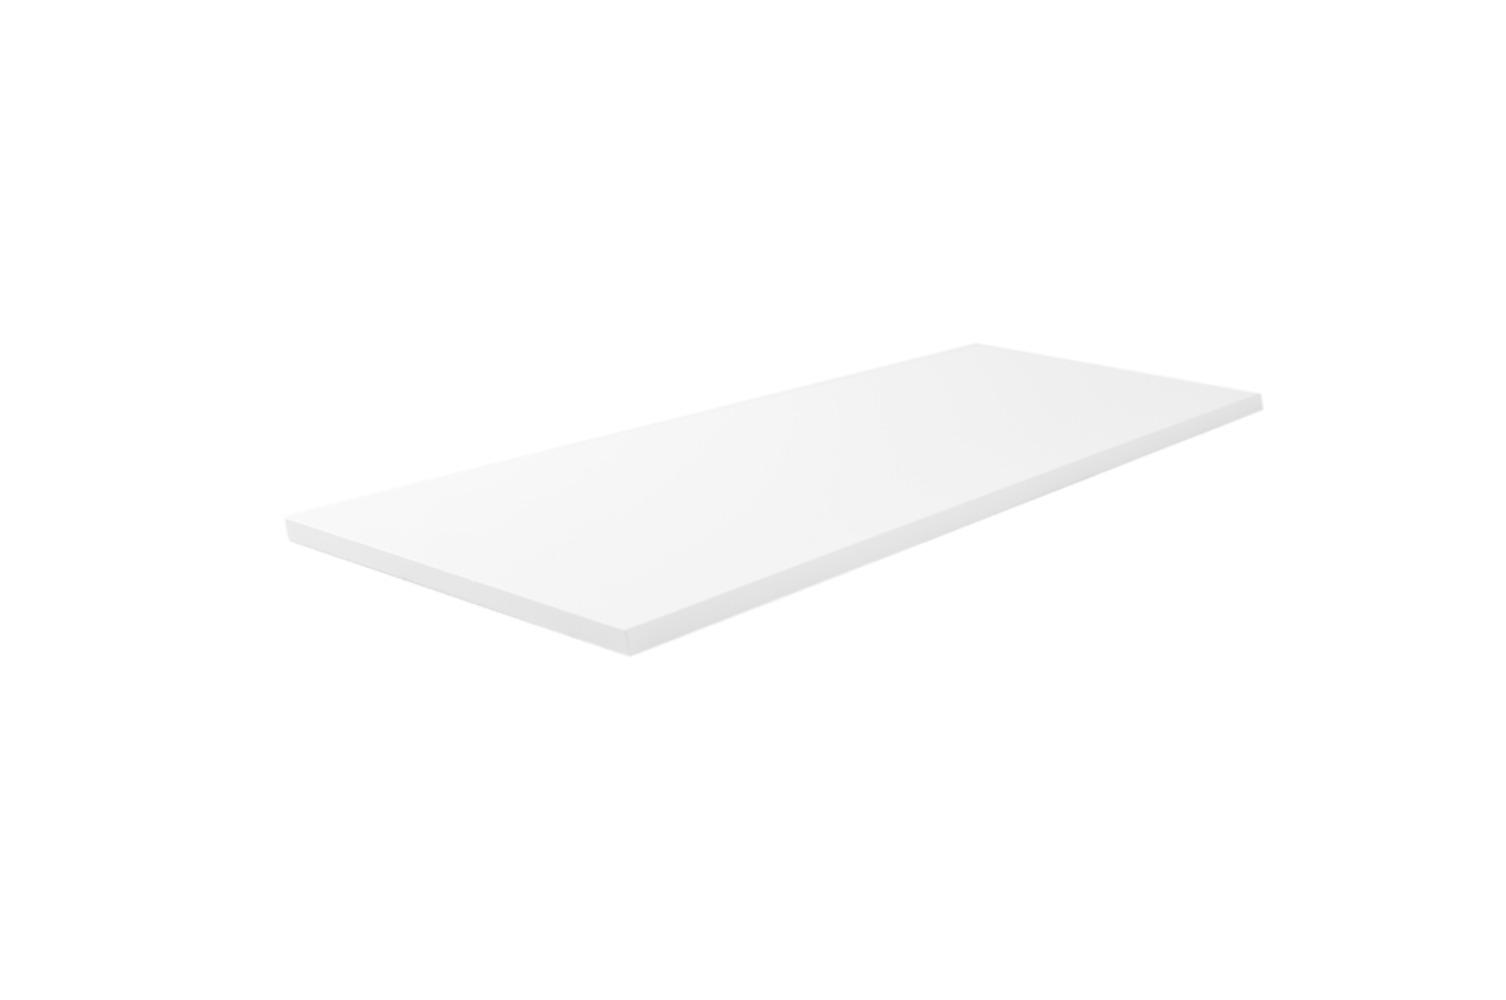 Wiesbaden Vision topblad 101x47,5x2,5 cm, wit